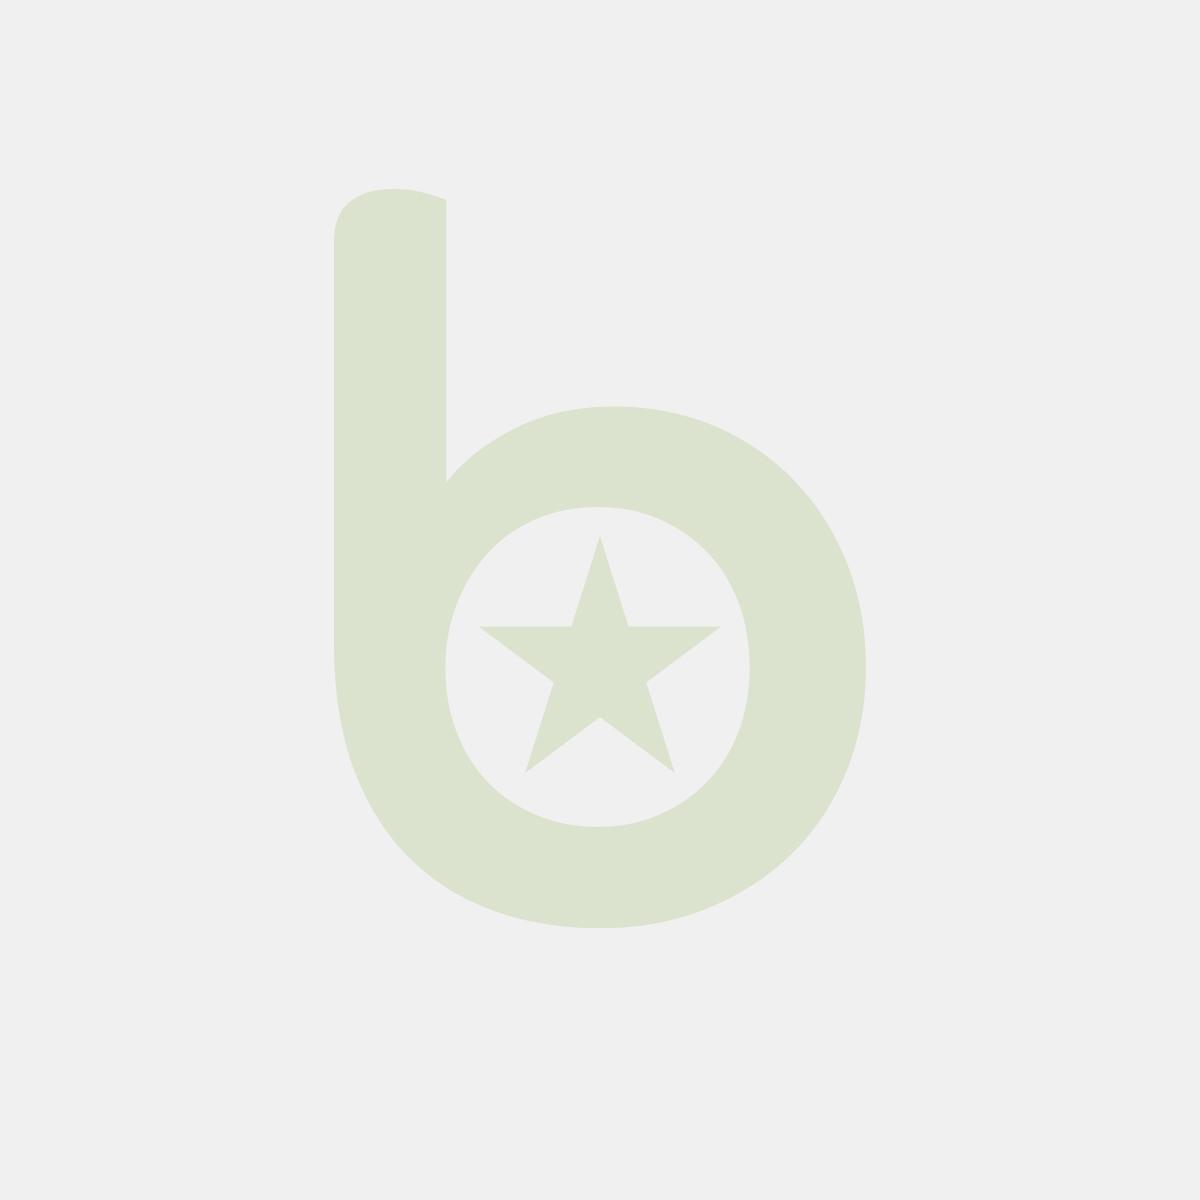 Gumka uniwersalna KEYROAD Pop-Star, 2szt., blister, mix kolorów